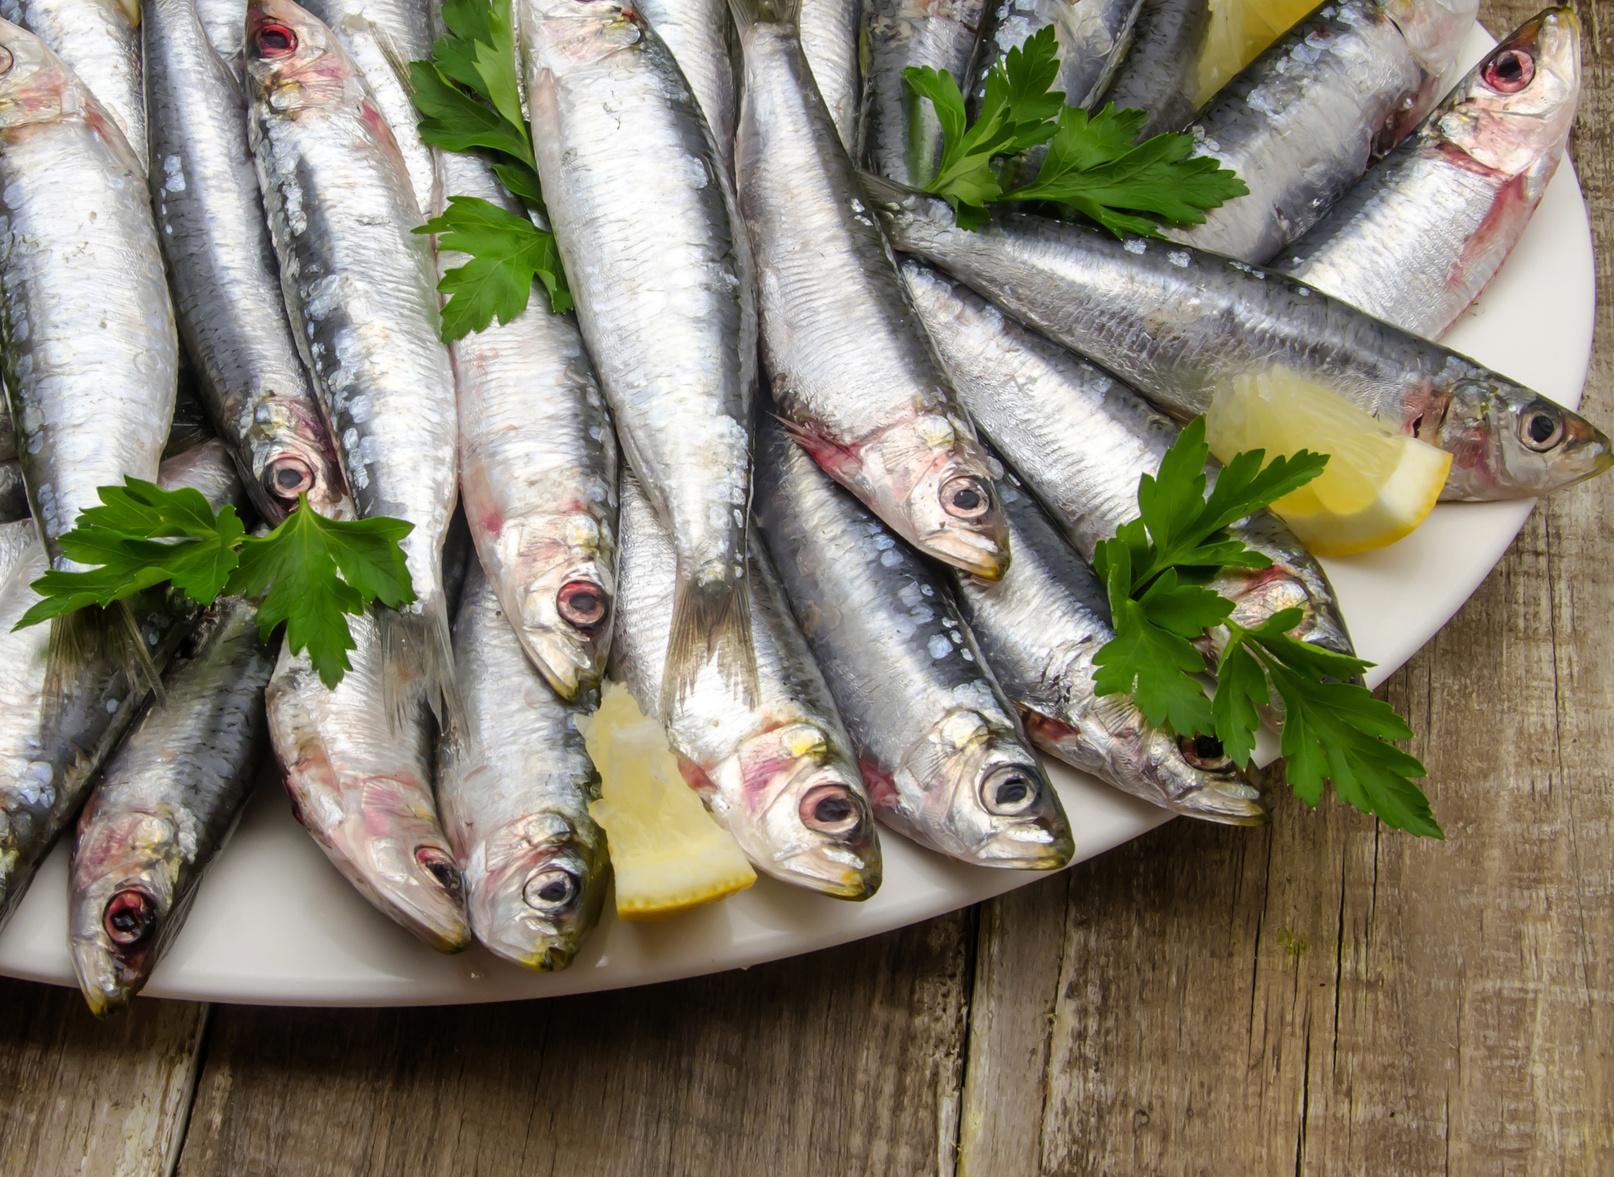 Recettes sardine cuisine madame figaro - Accompagnement sardines grillees barbecue ...